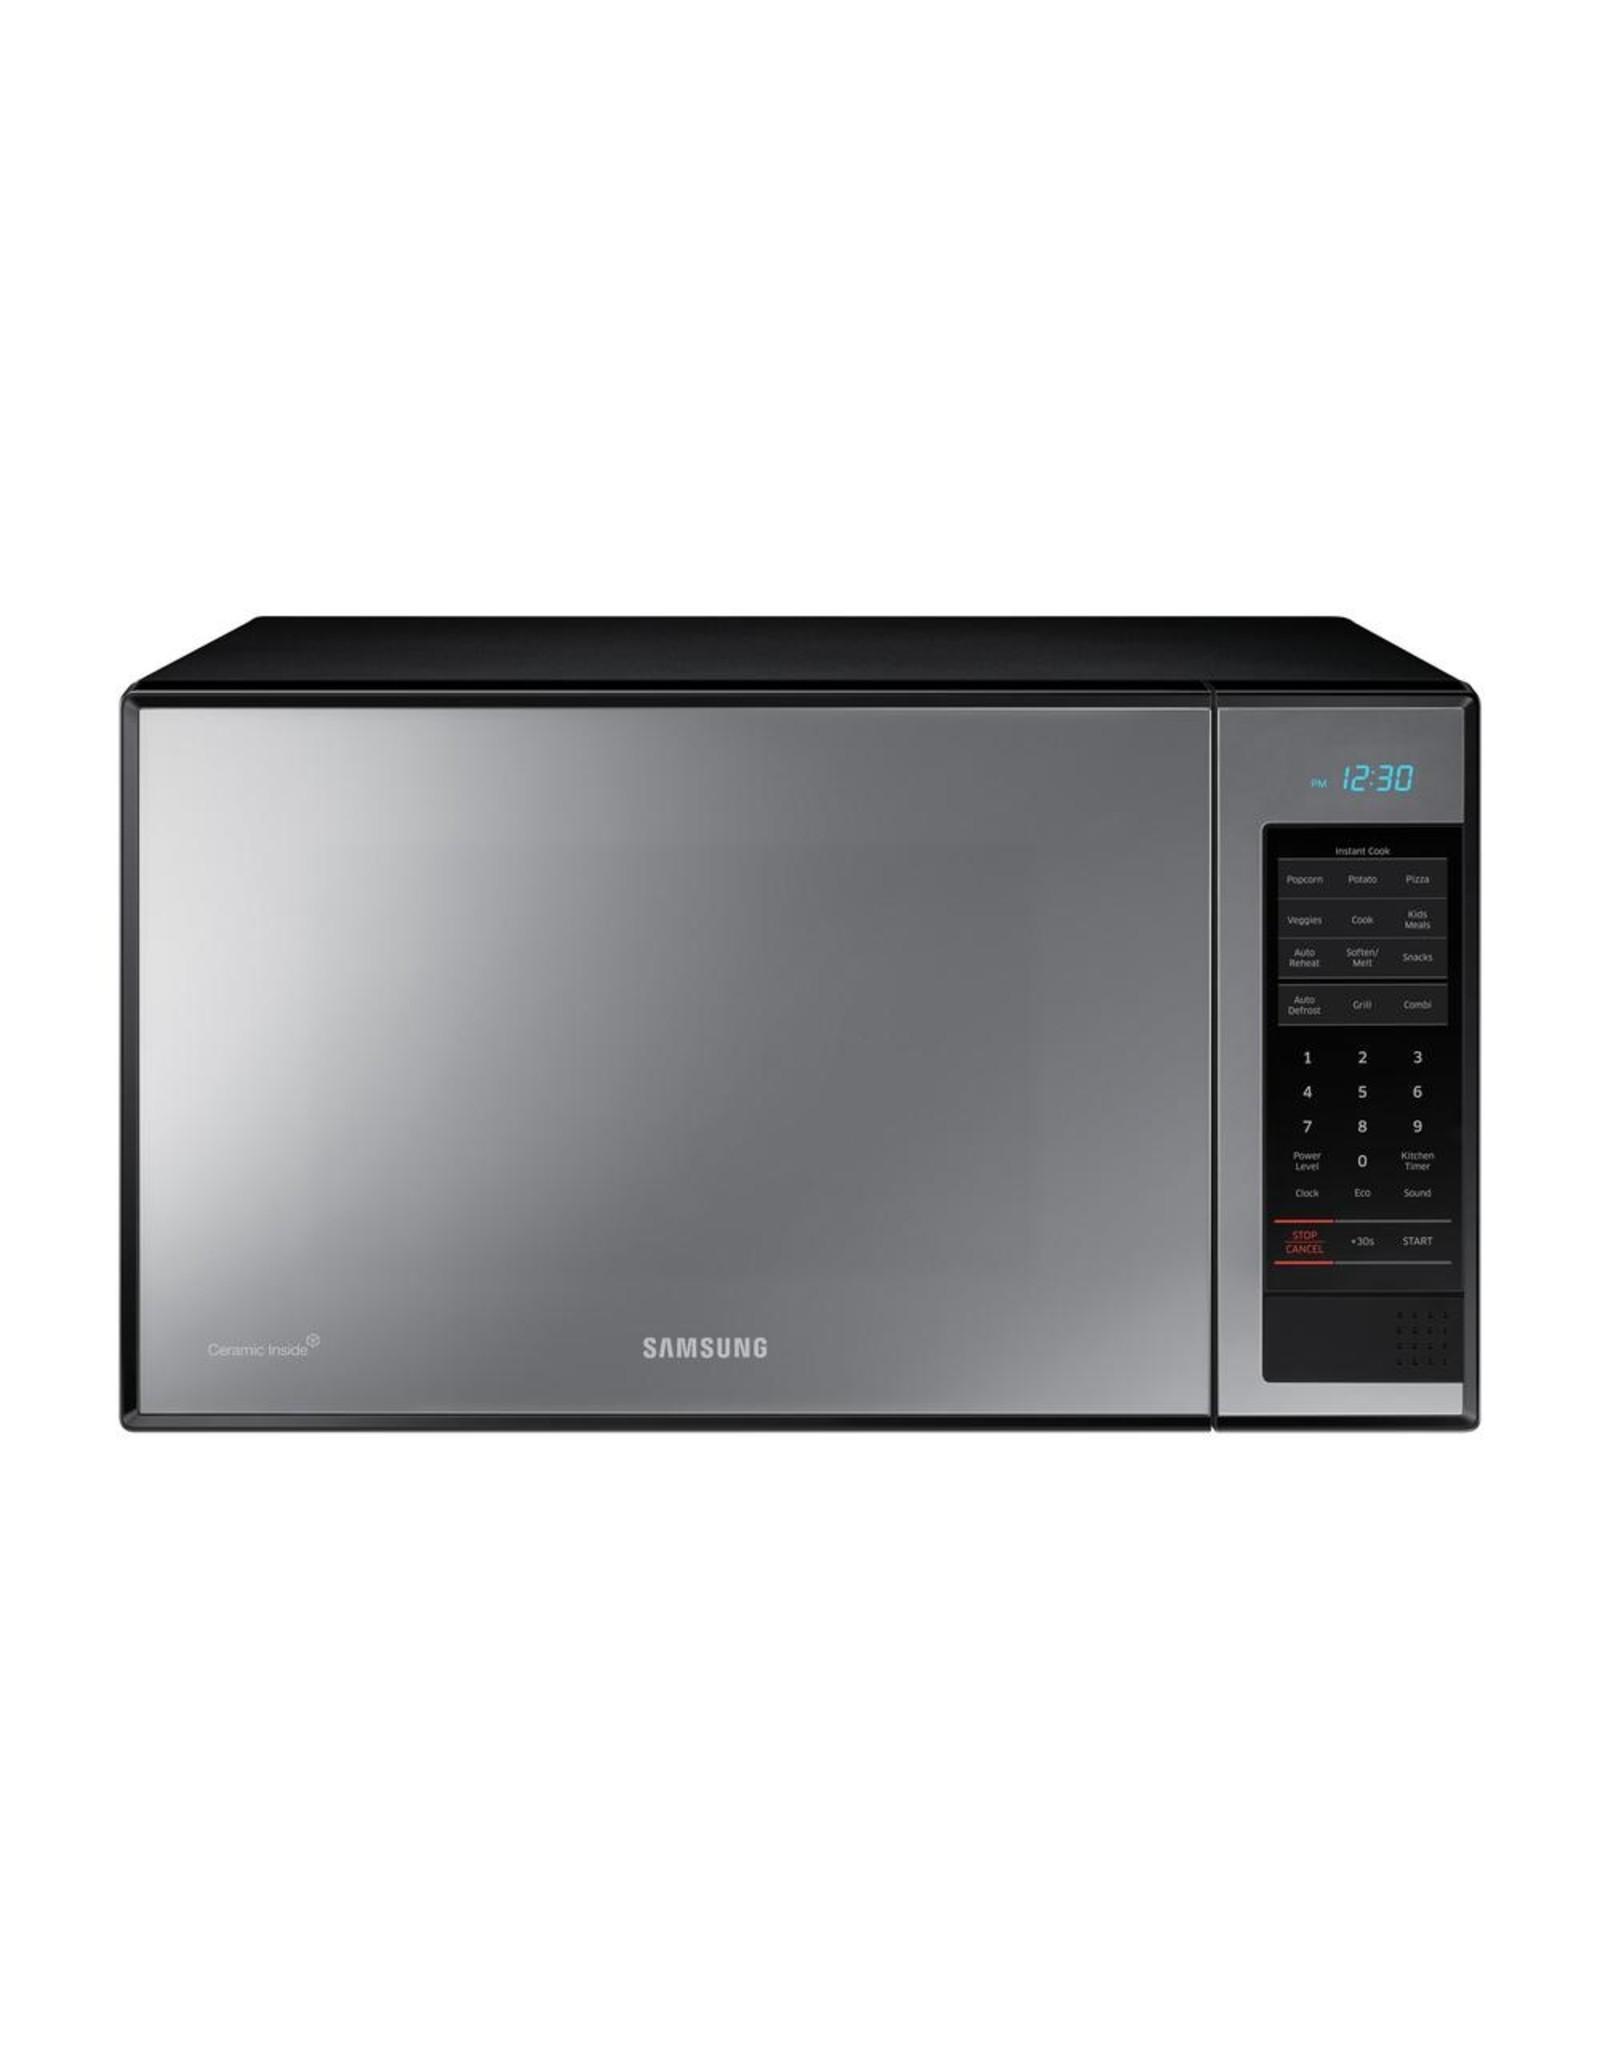 SAMSUNG MG14H3020CM Samsung 1.4 Cu. Ft. 950 Watt, CounterTop Microwave